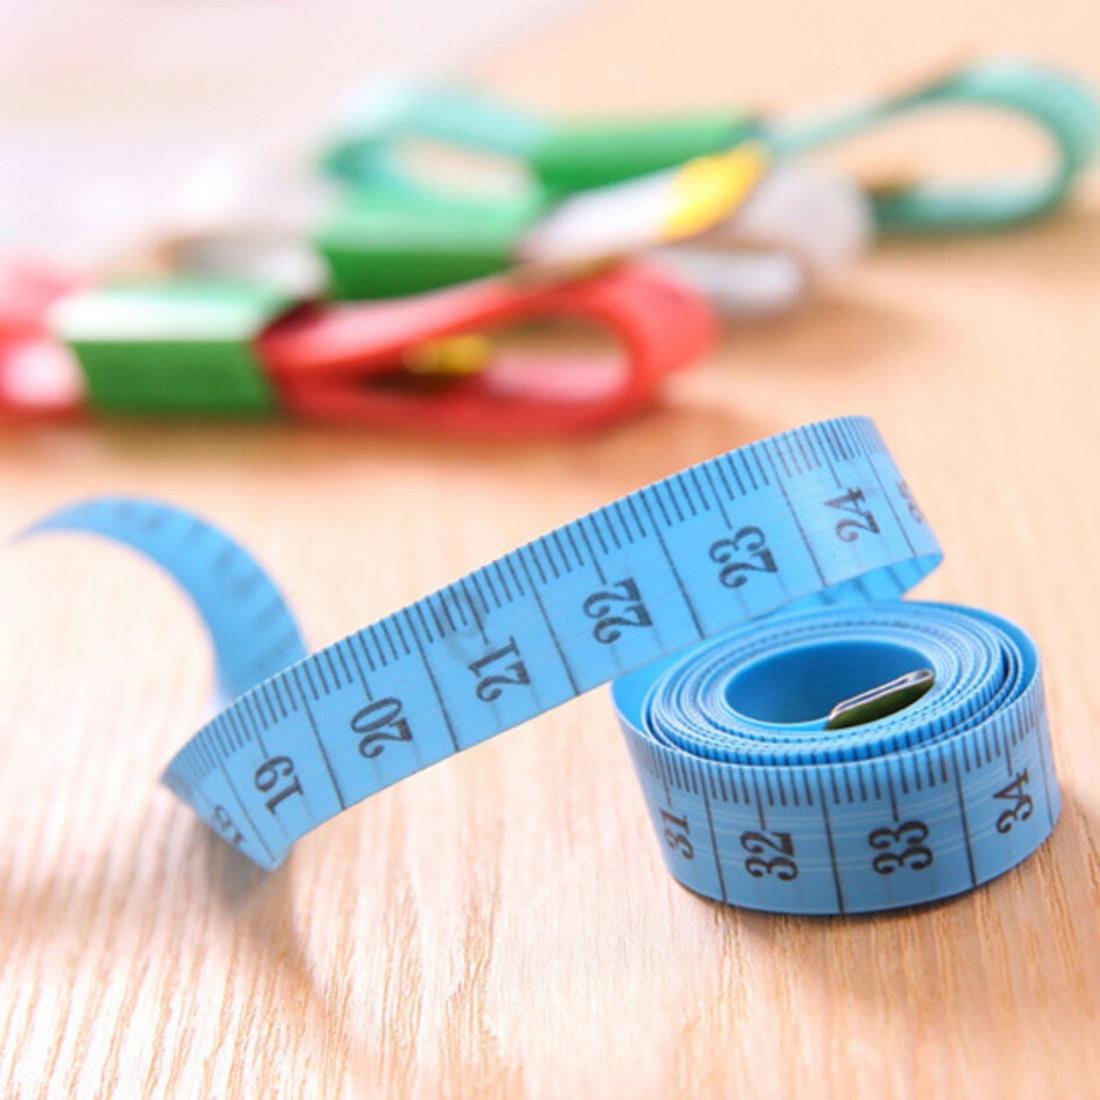 1.5M Sewing Ruler Meter Sewing Measuring Tape Body Measuring Ruler Sewing Tailor Tape Measure Soft Random Color